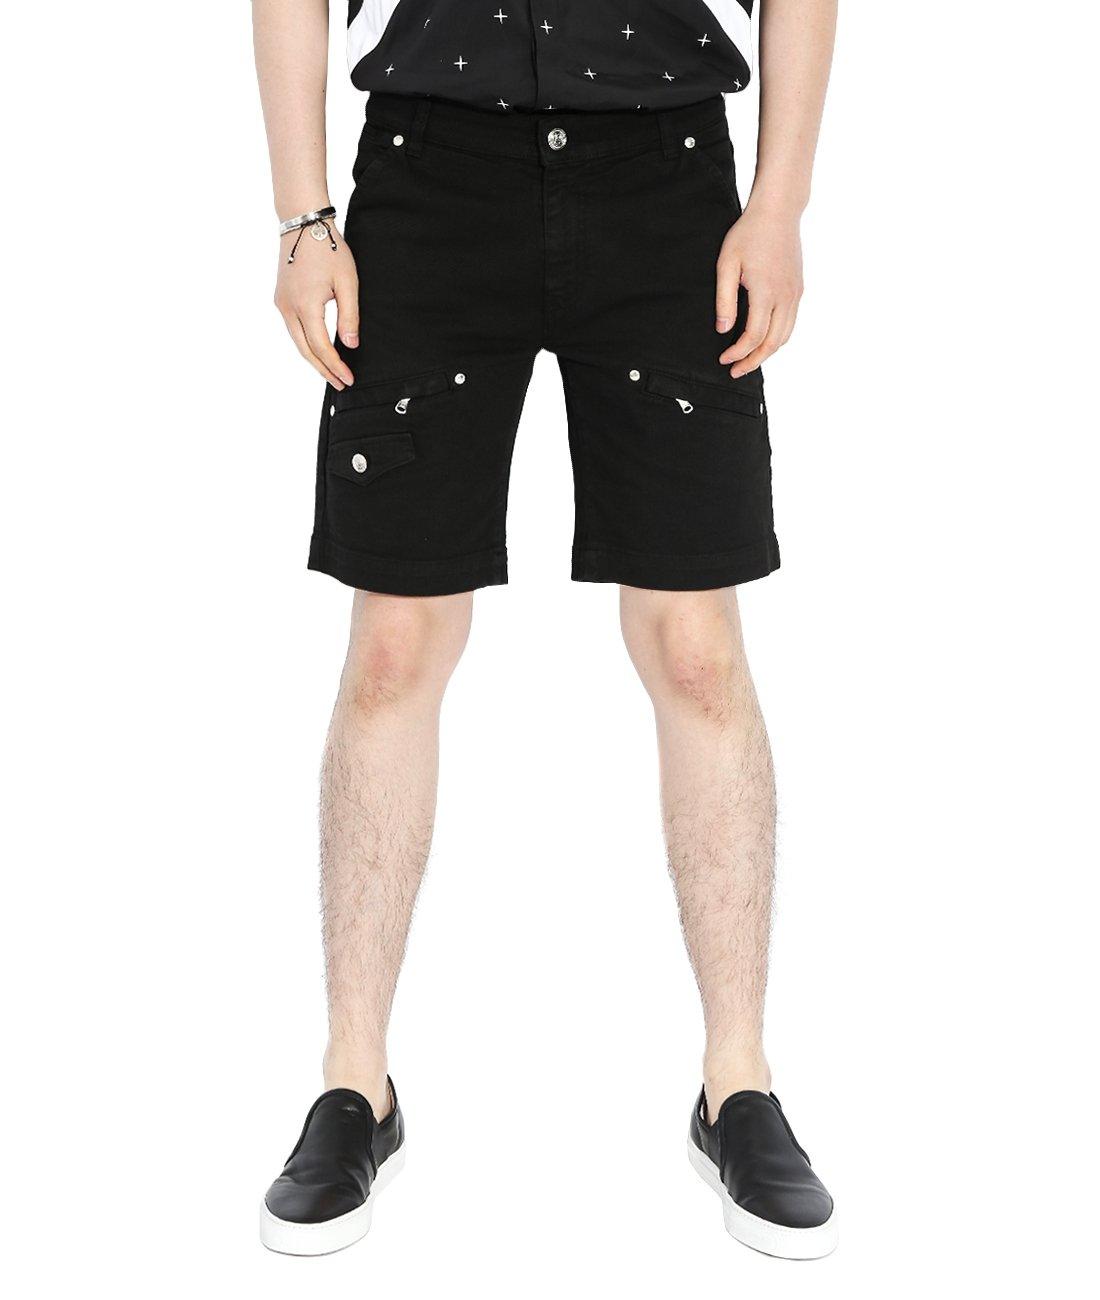 Wiberlux Pierre Balmain Men's Multi Pocket Rivet Studded Shorts 52 Black